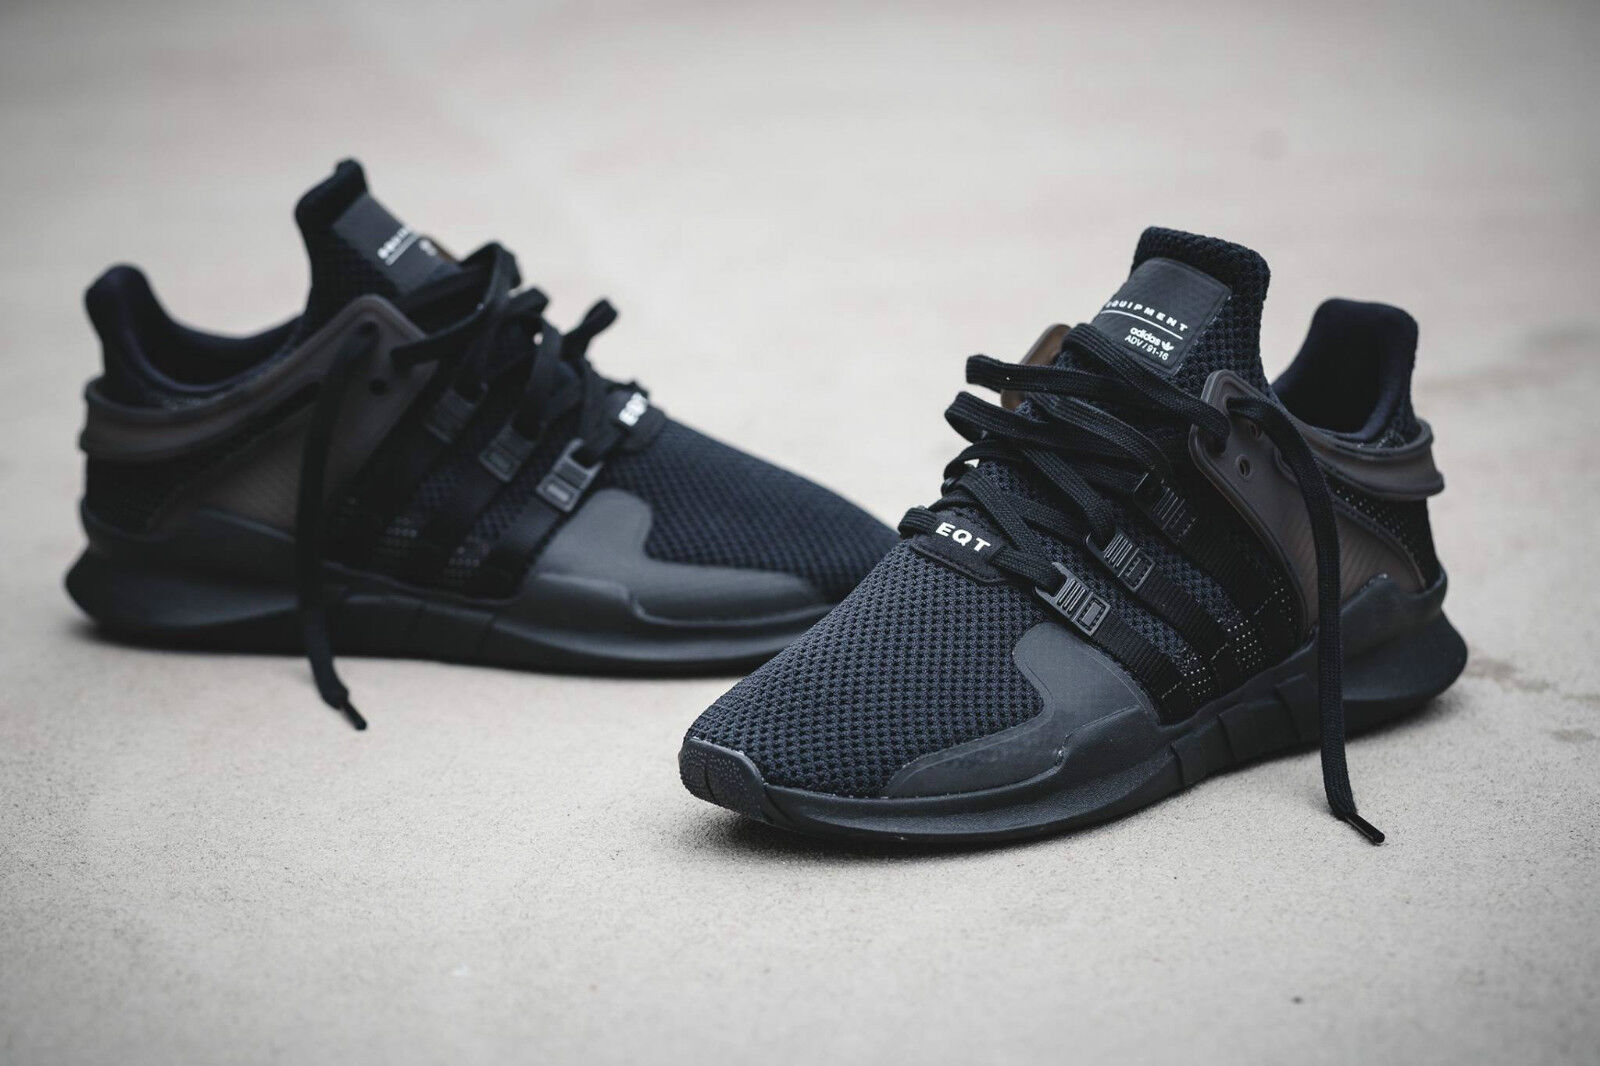 Adidas Adidas Adidas eqt nero / bianco supporto avanzata ba8324 ba8322 (dimensioni) spinta pk 3b8c7e